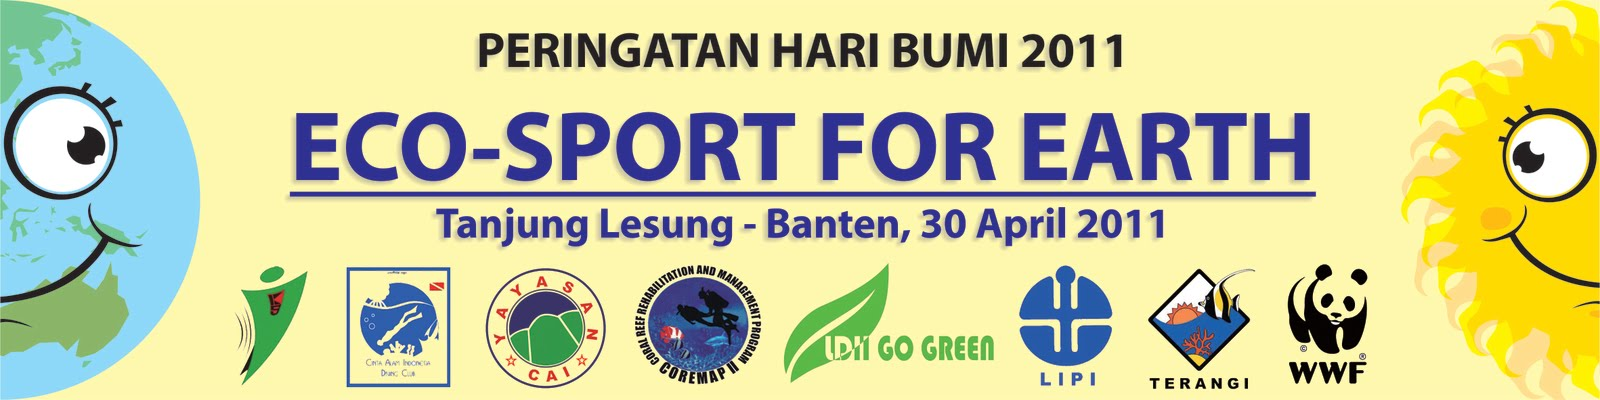 LDII Go Green 2011